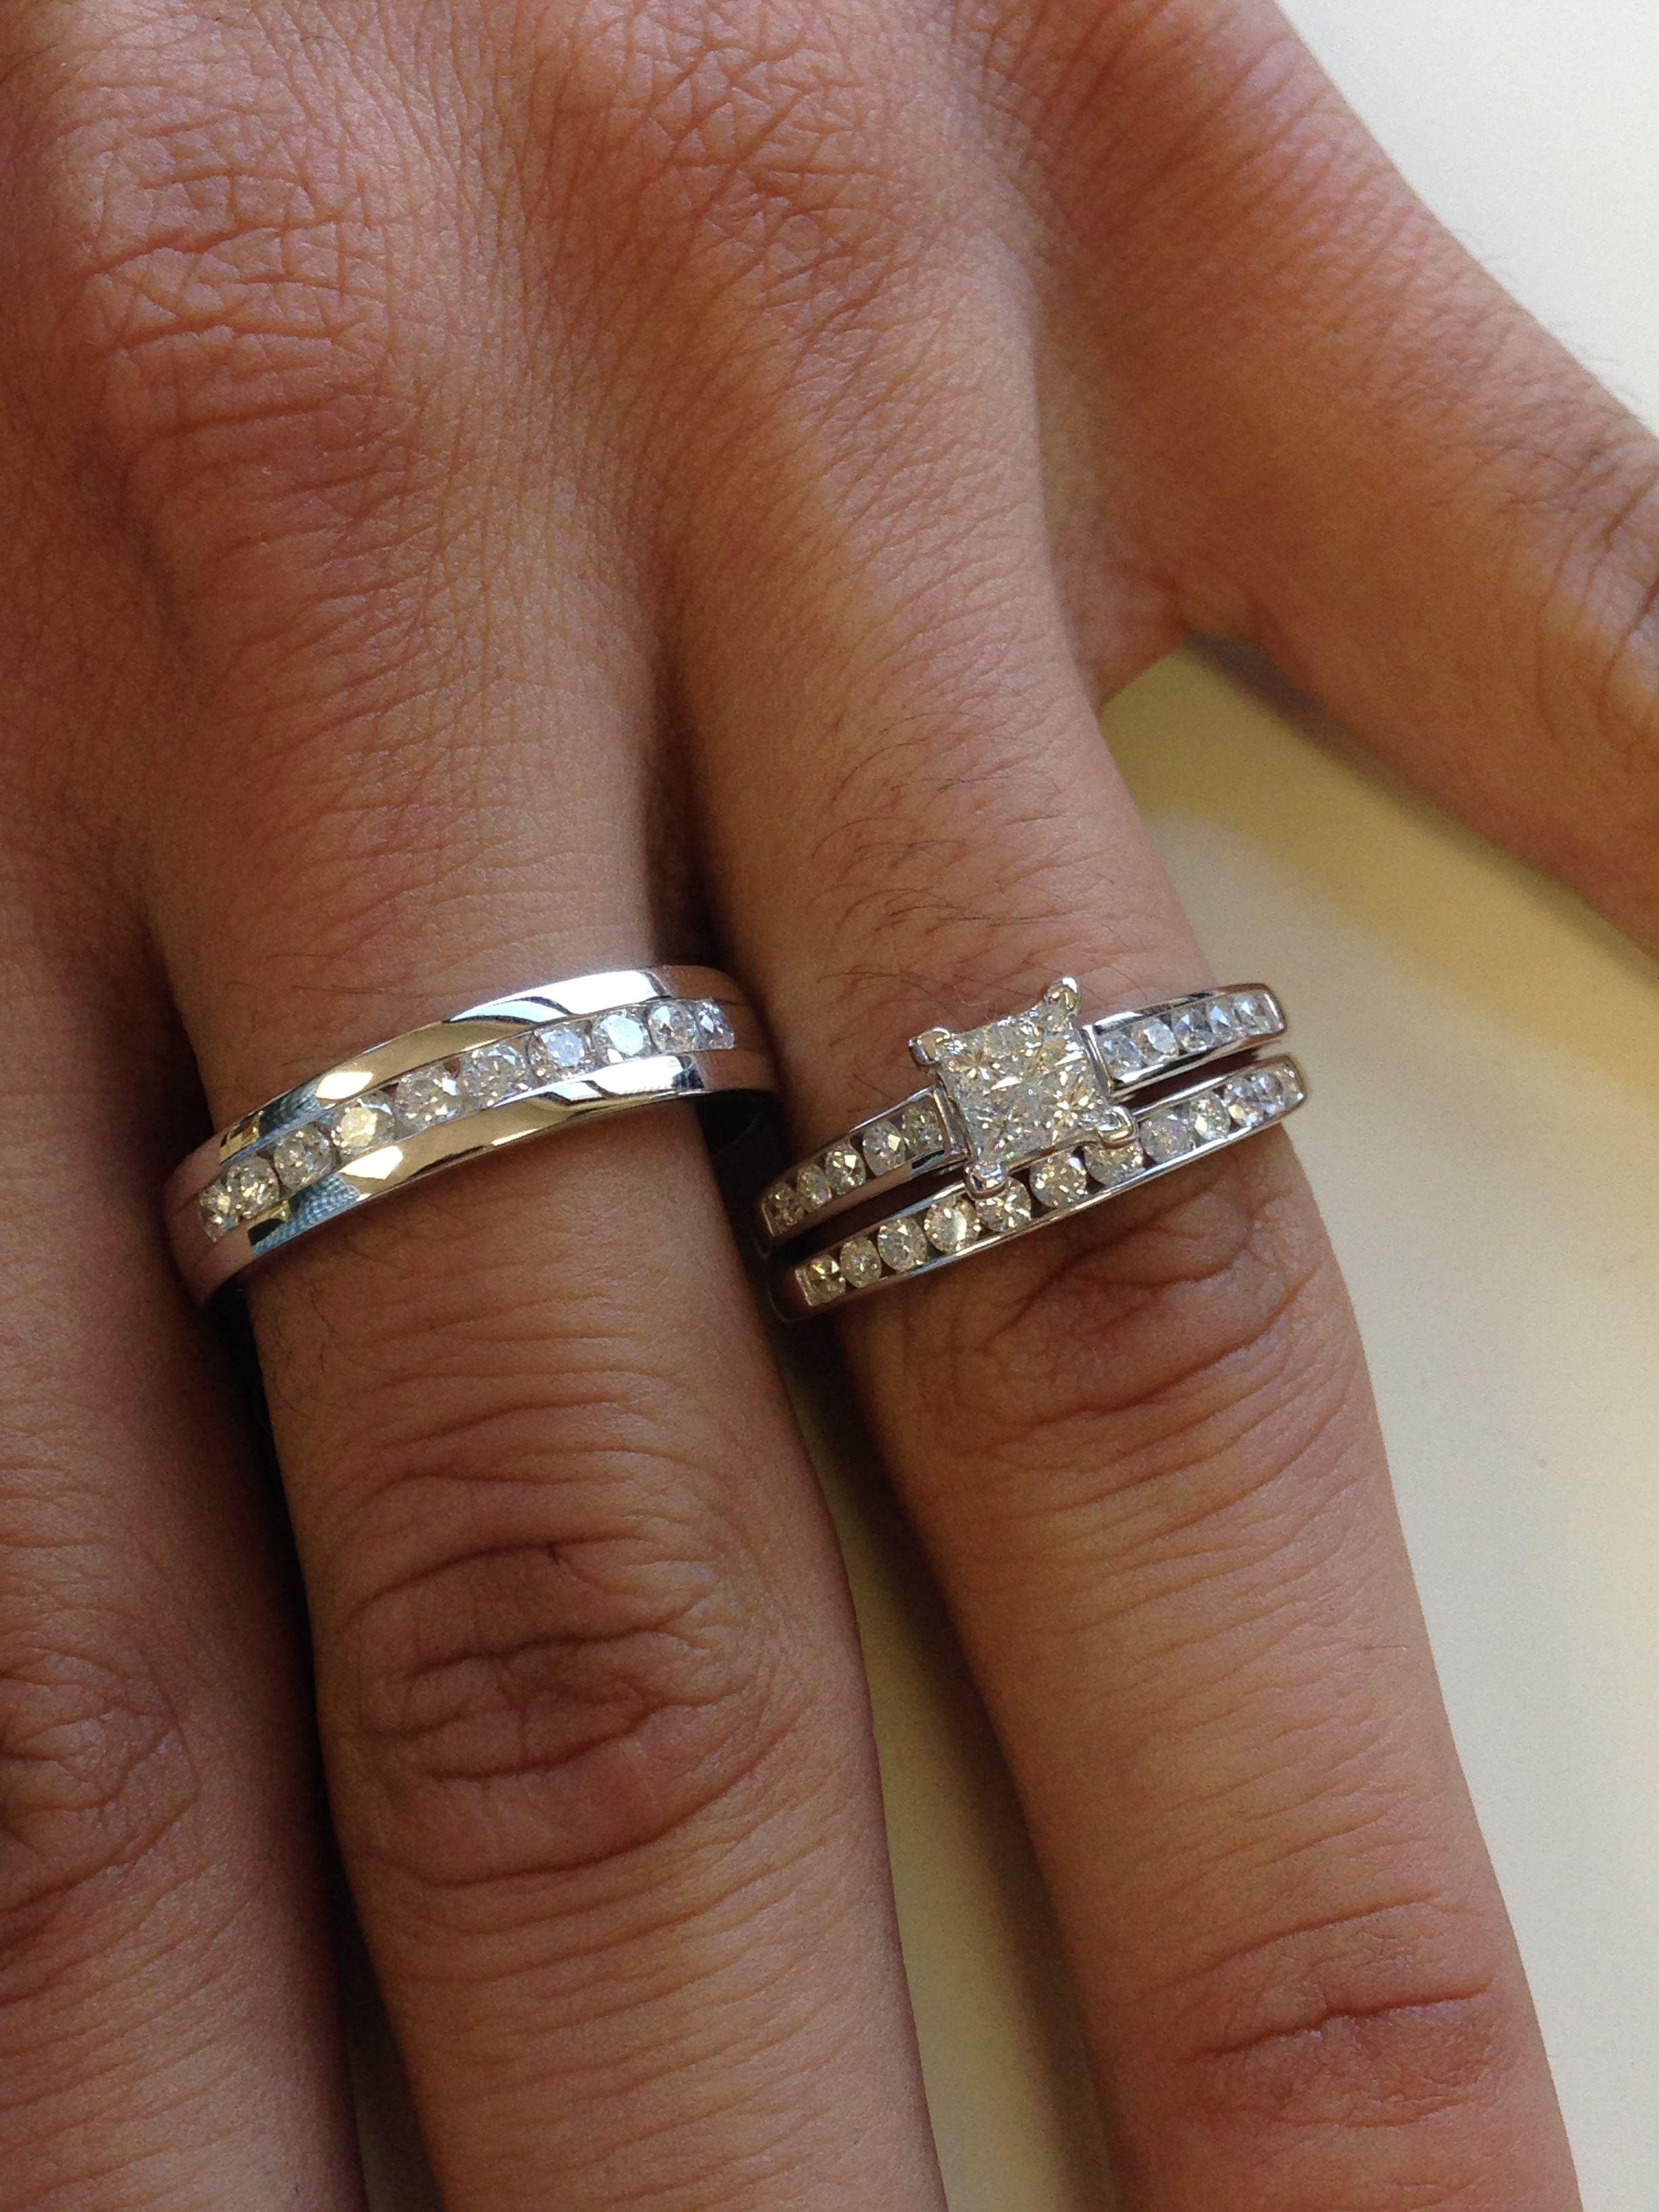 Rings On Hand Trio Ring Set Bt590w Engagement Ring Ladies